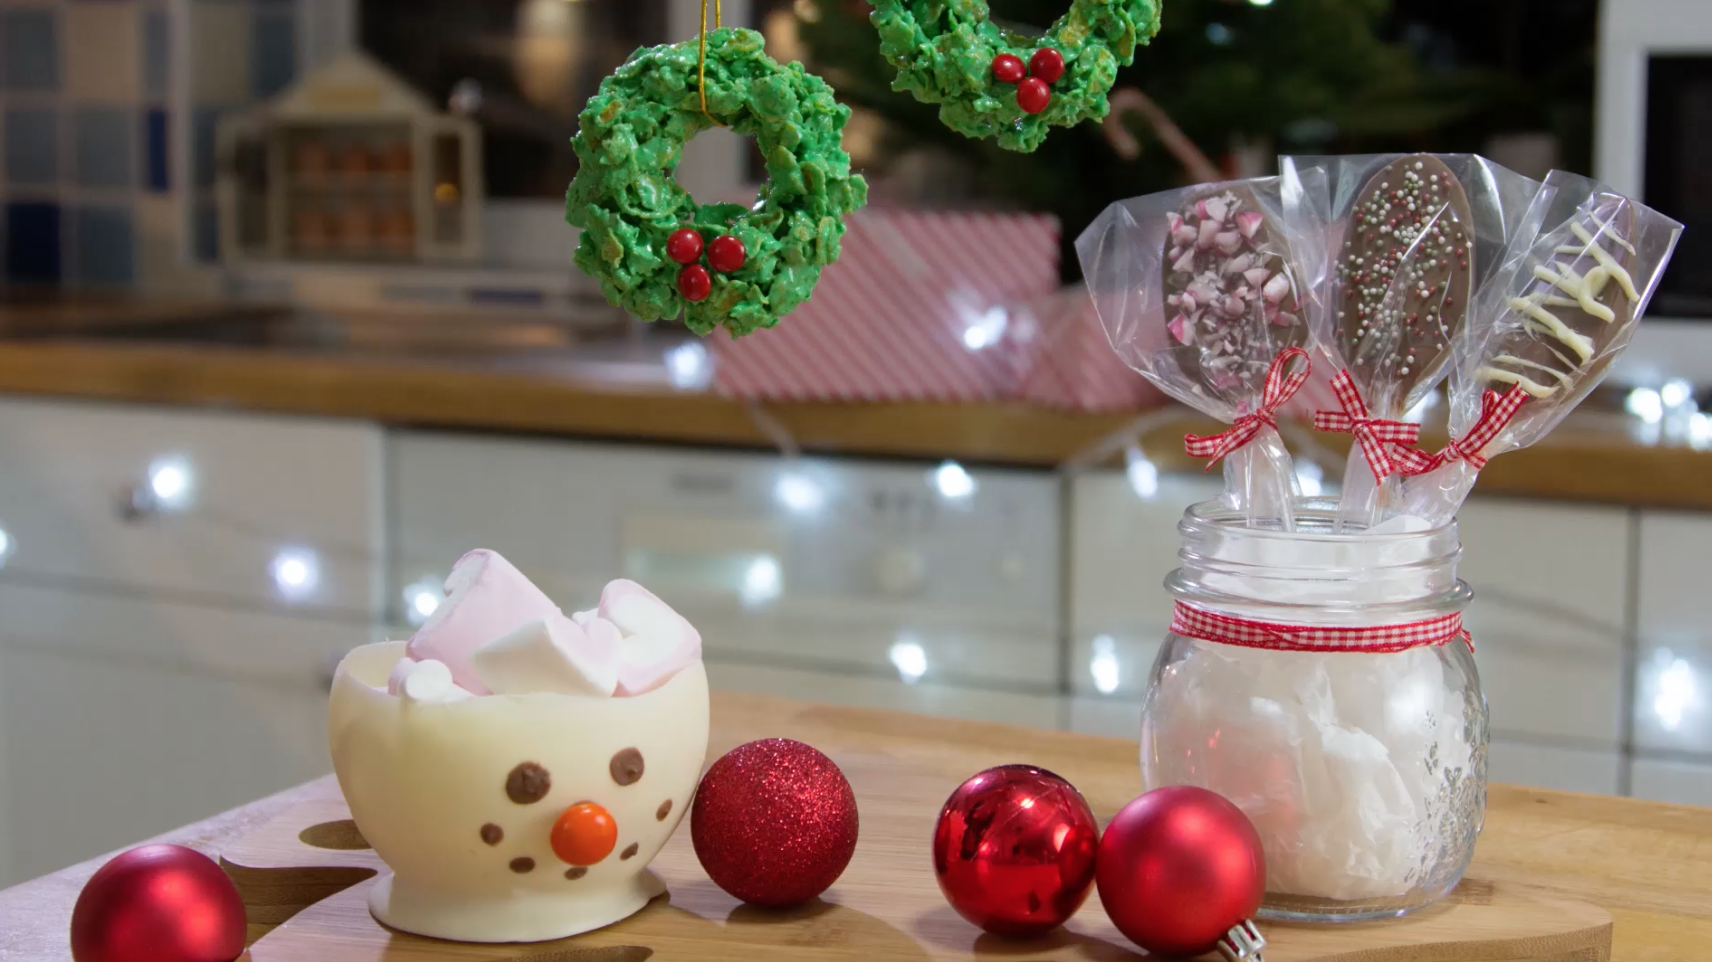 Christmas Gift Ideas: Cornflake Wreath, Snowman Bowl & Chocolate Spoons